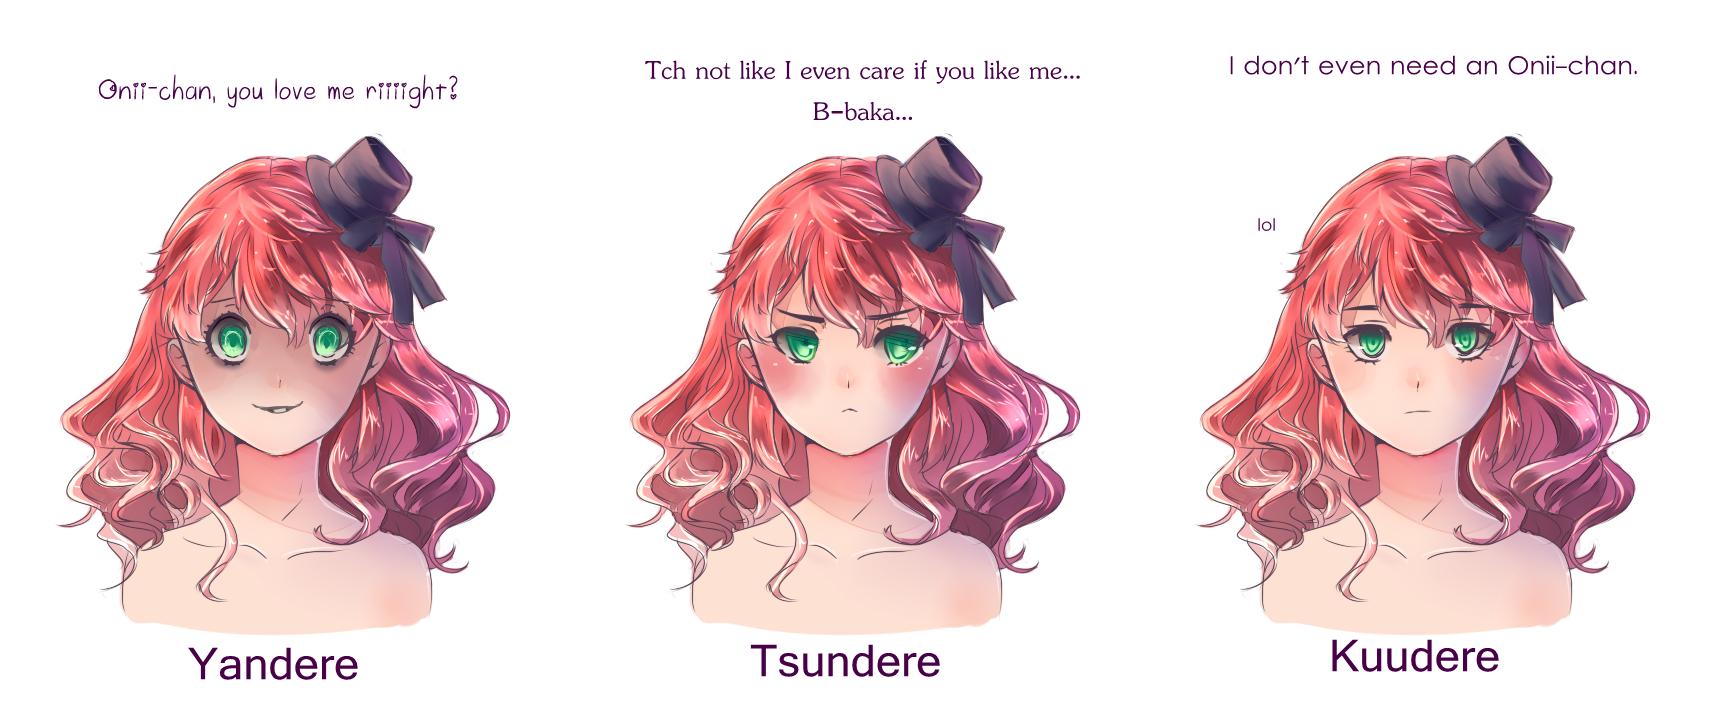 Anime Characters Kuudere : Yandere tsundere and kuudere by luumies on deviantart